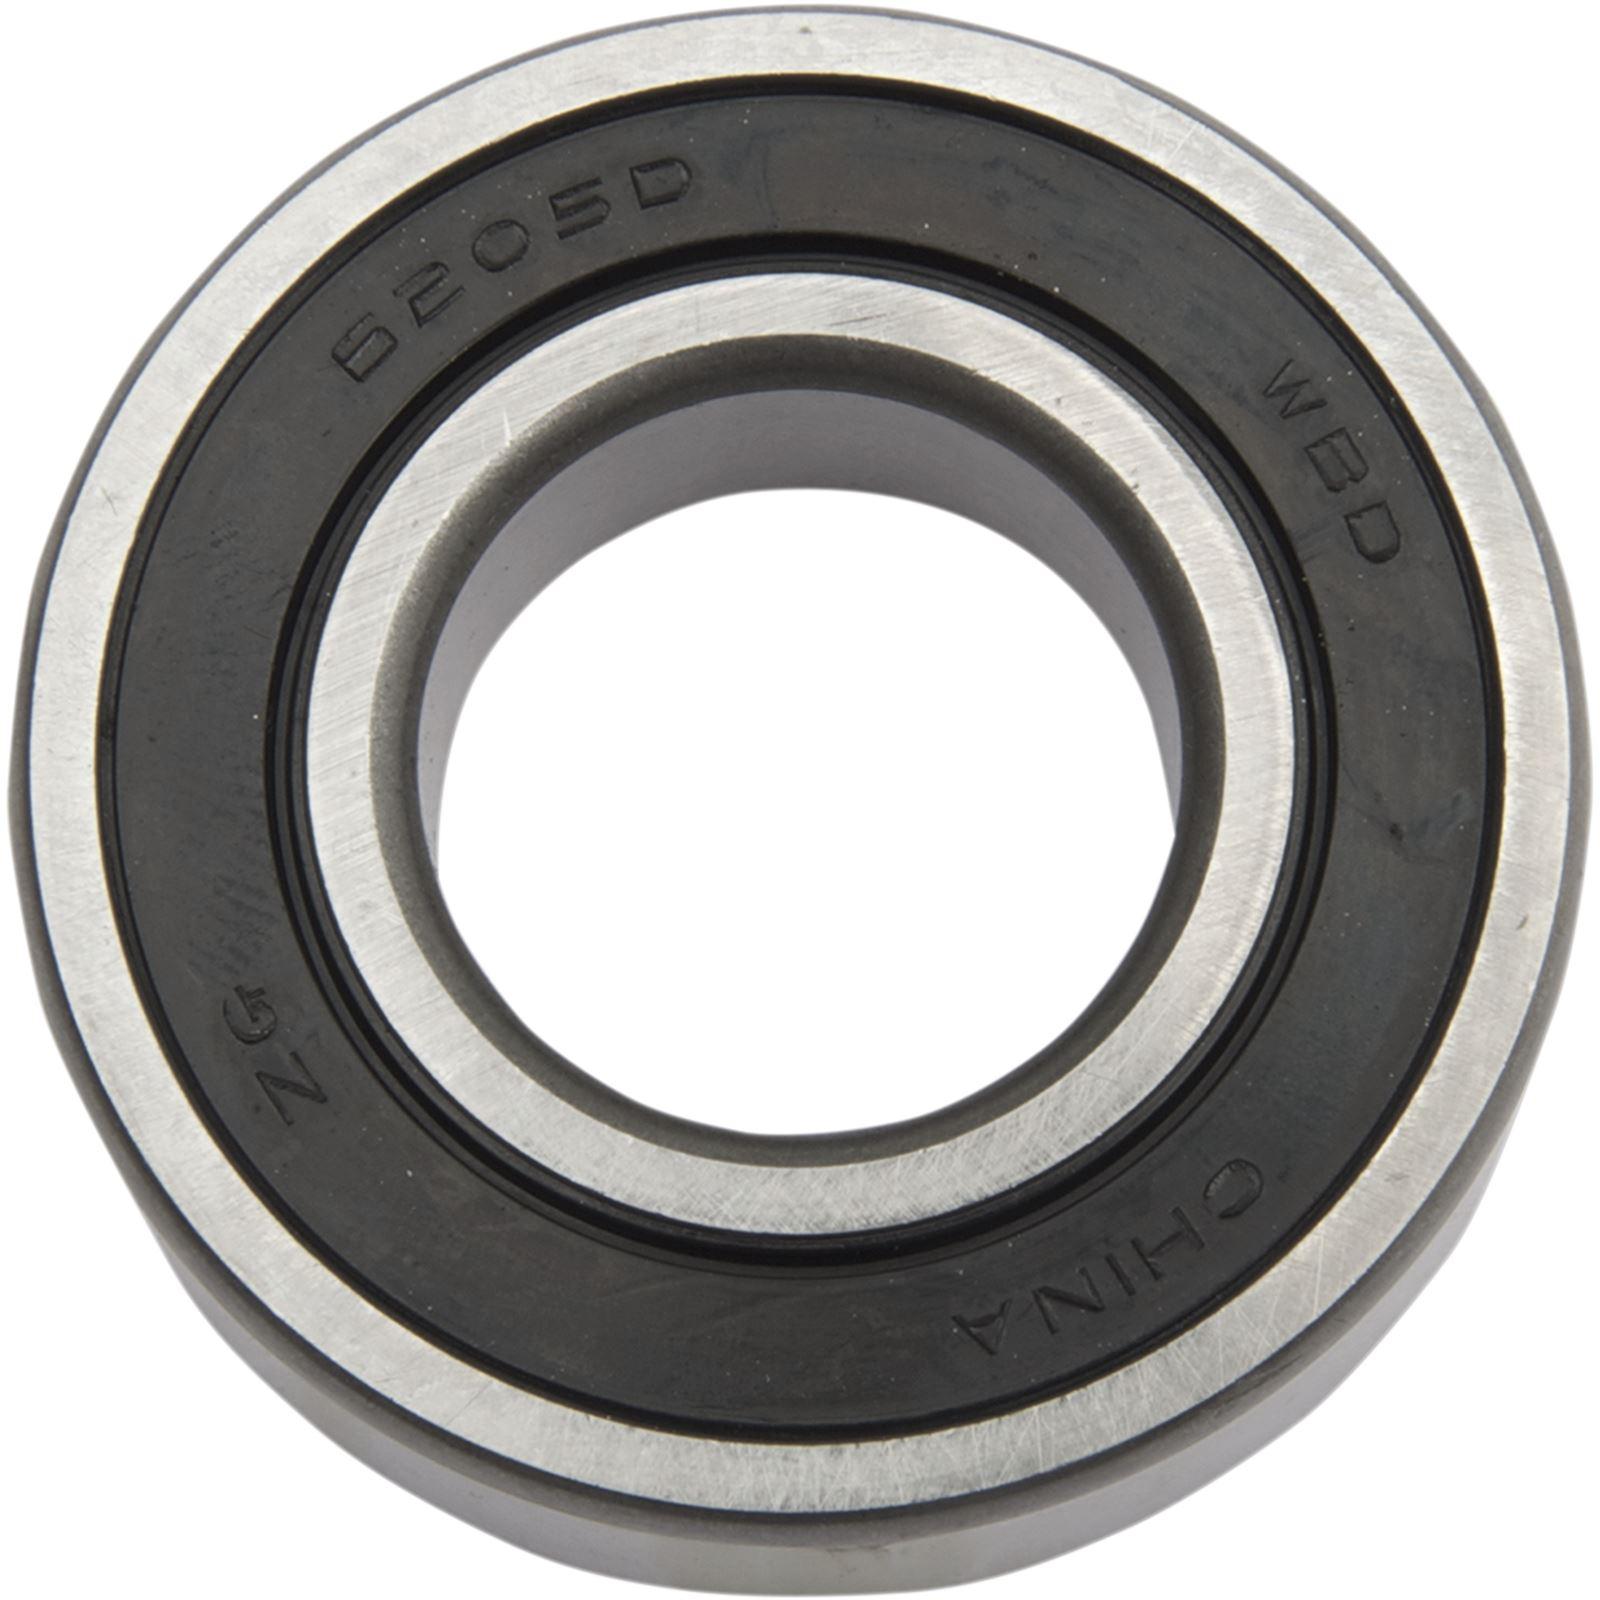 Eastern Motorcycle Parts Bearing - 8980